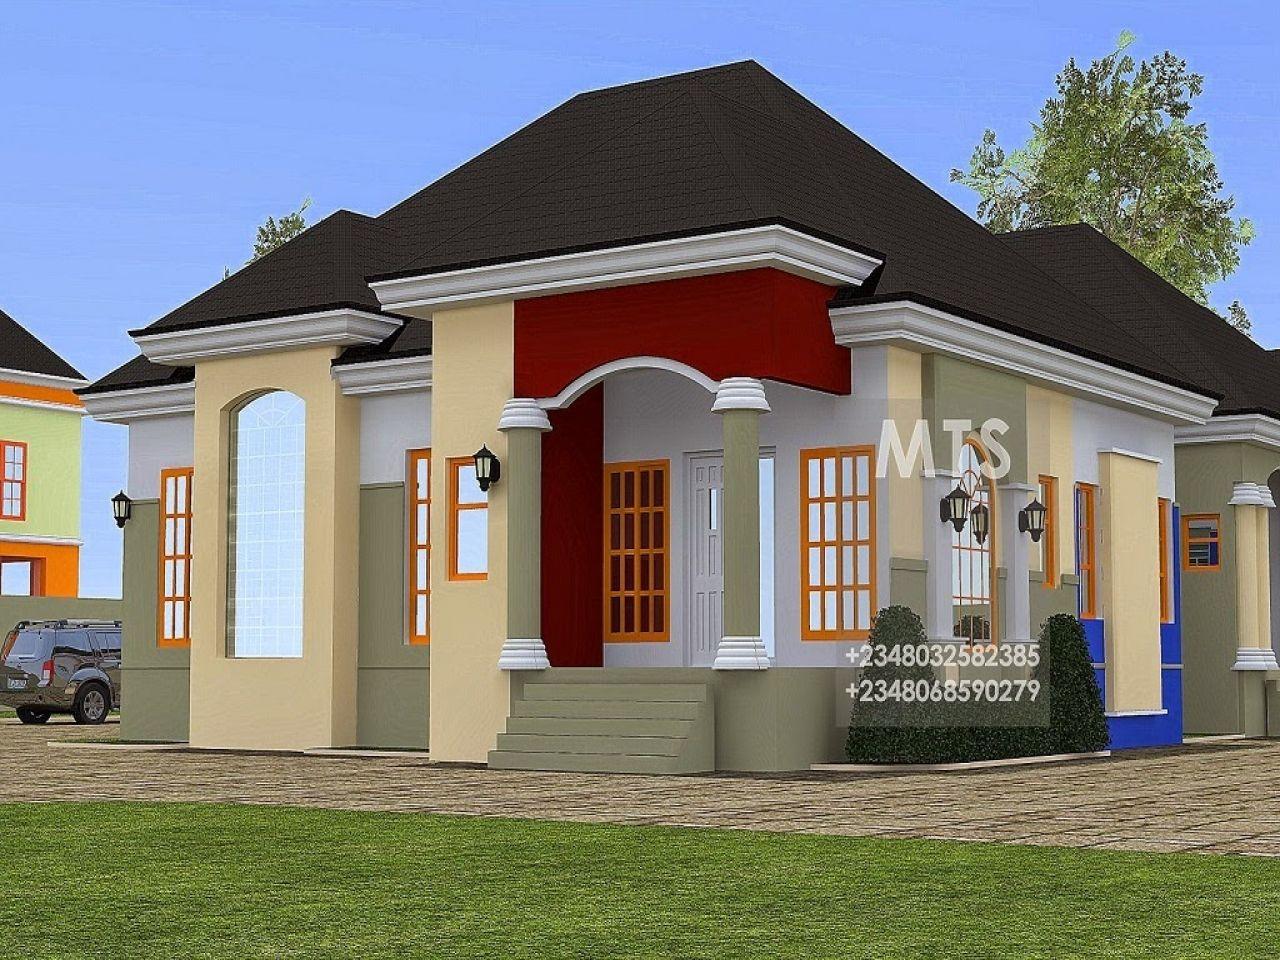 2 Bedroom Bungalow Design In Nigeria Bungalow House Design